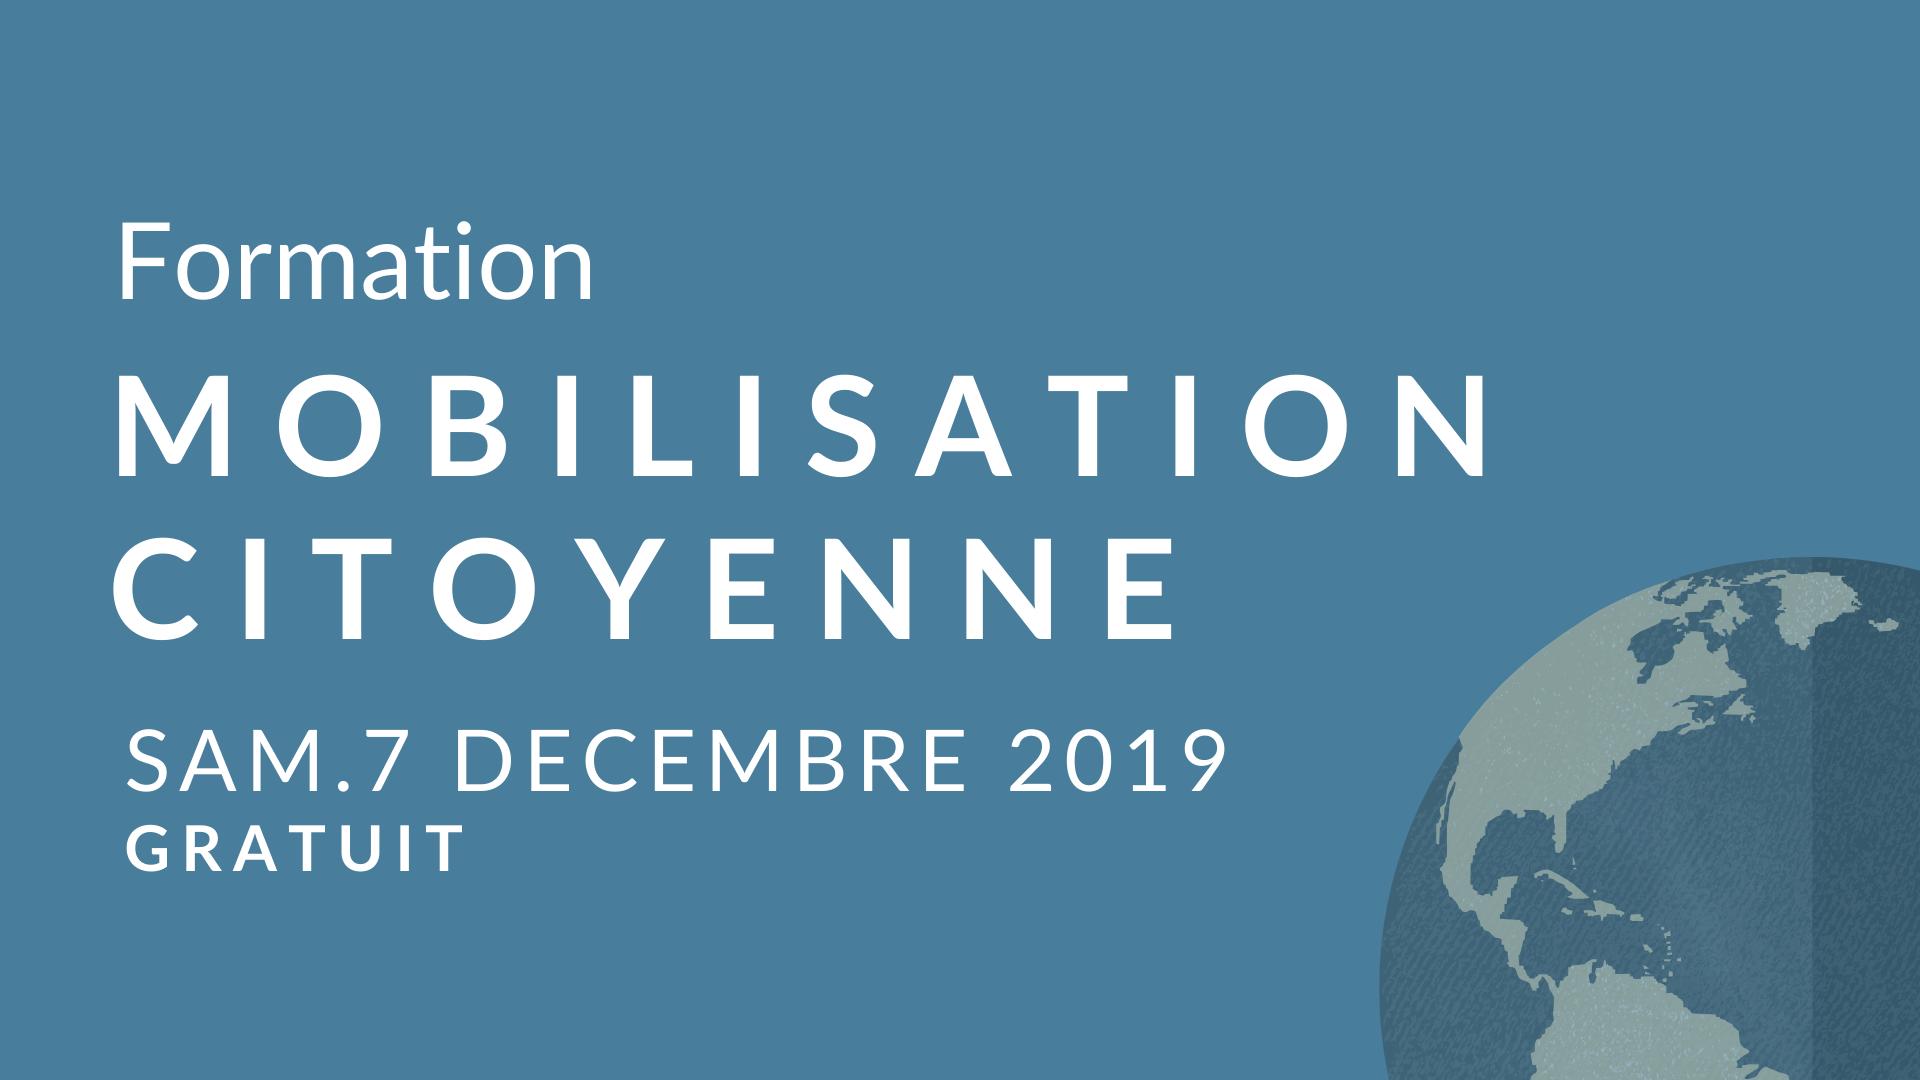 mobilisation_citoyenne-2.png